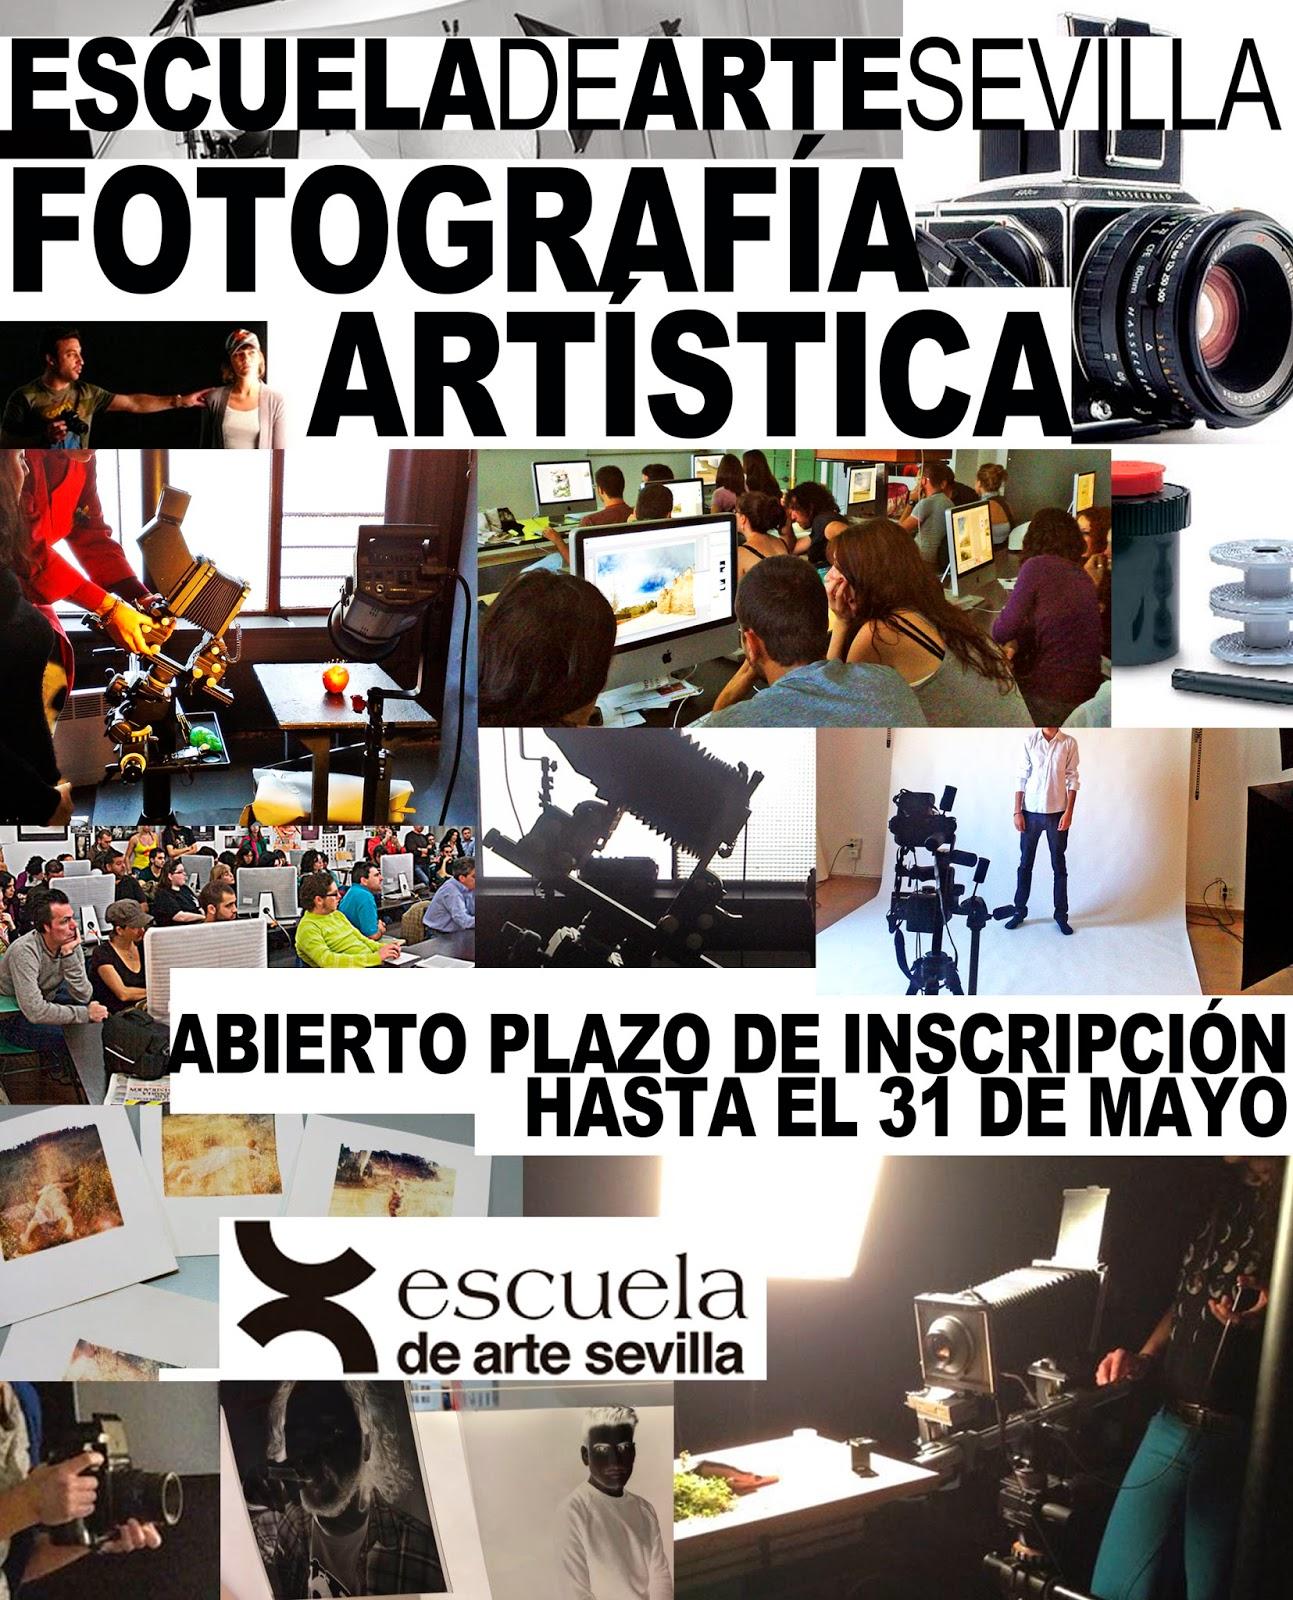 http://www.escueladeartedesevilla.blogspot.com.es/